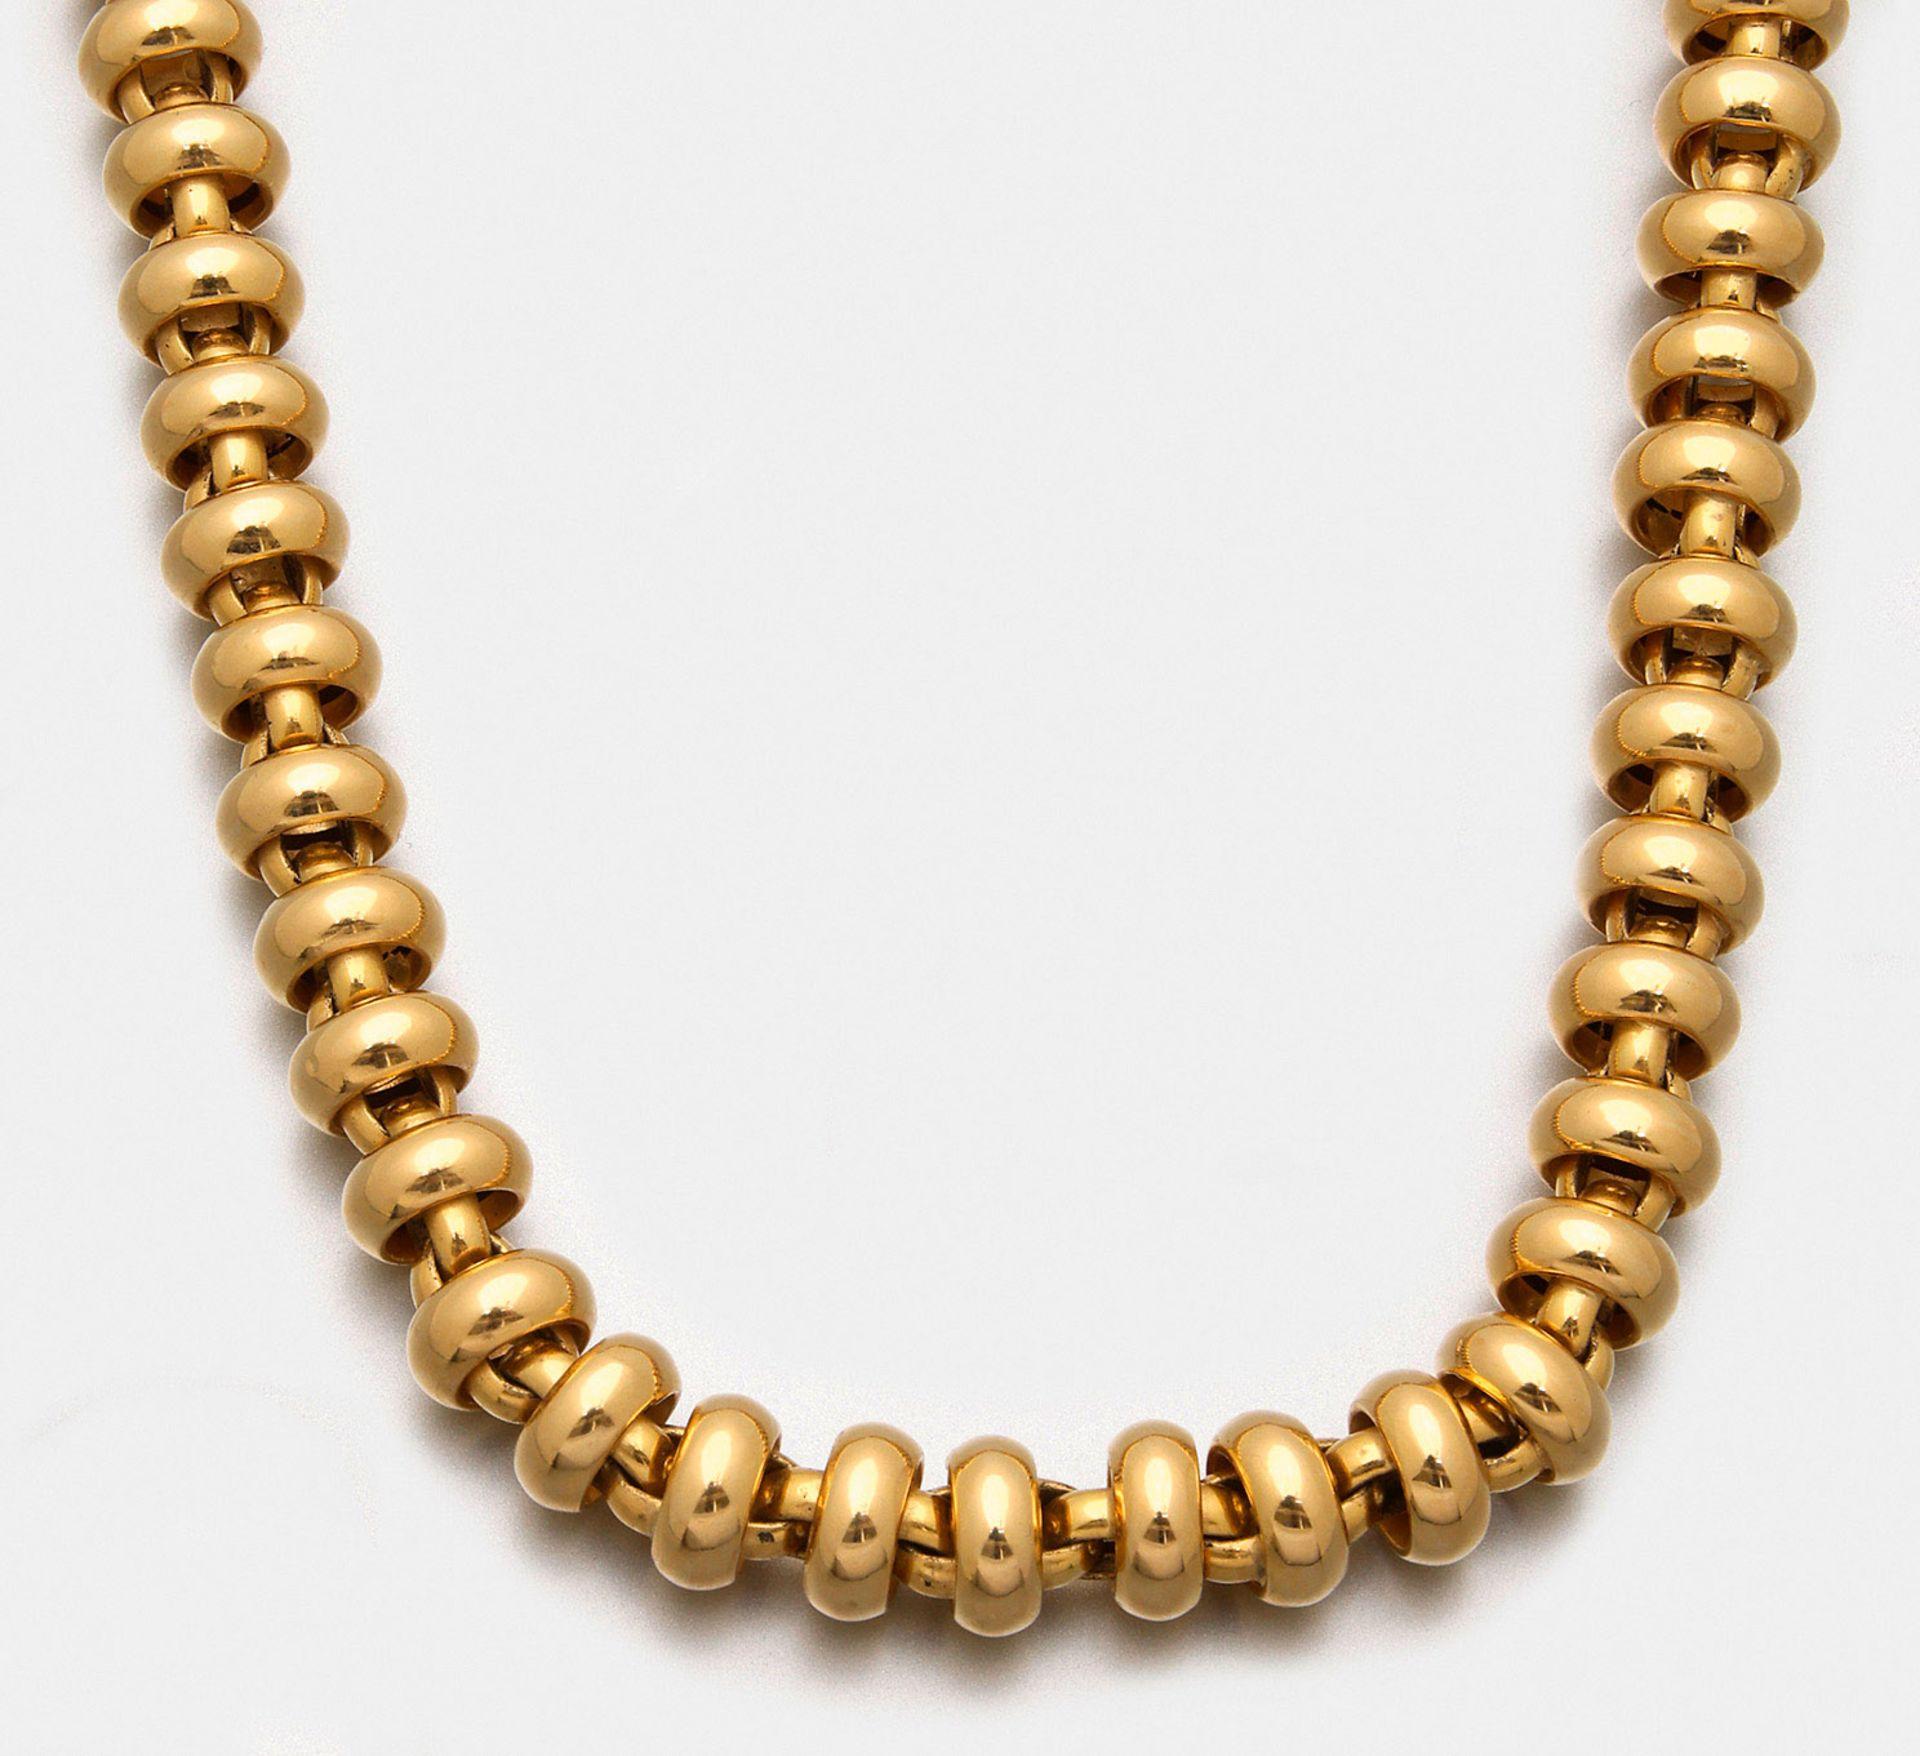 Repräsentatives Goldcollier